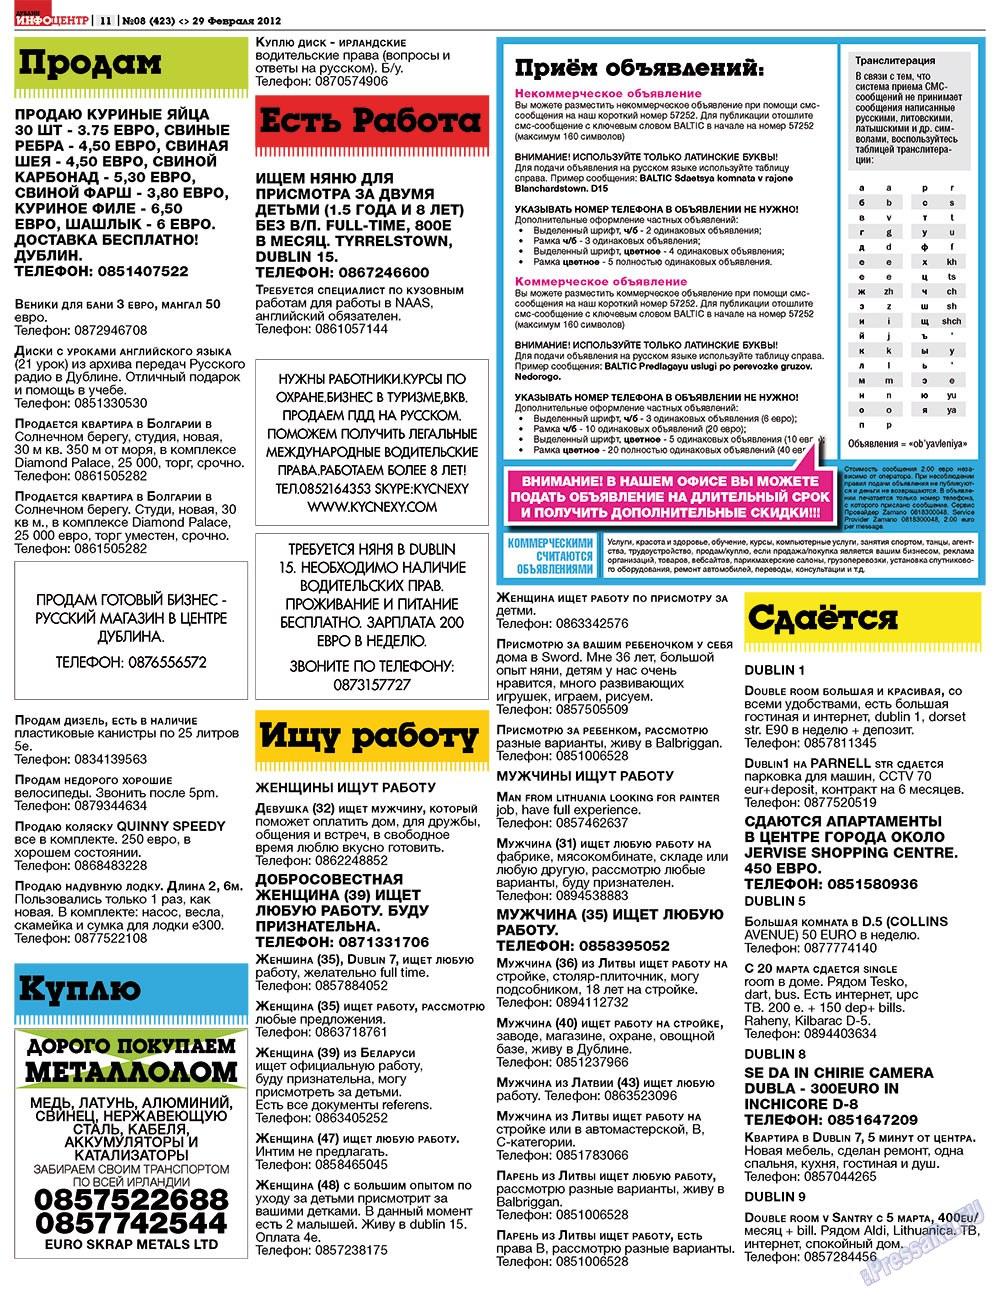 Дублин инфоцентр (газета). 2012 год, номер 8, стр. 11